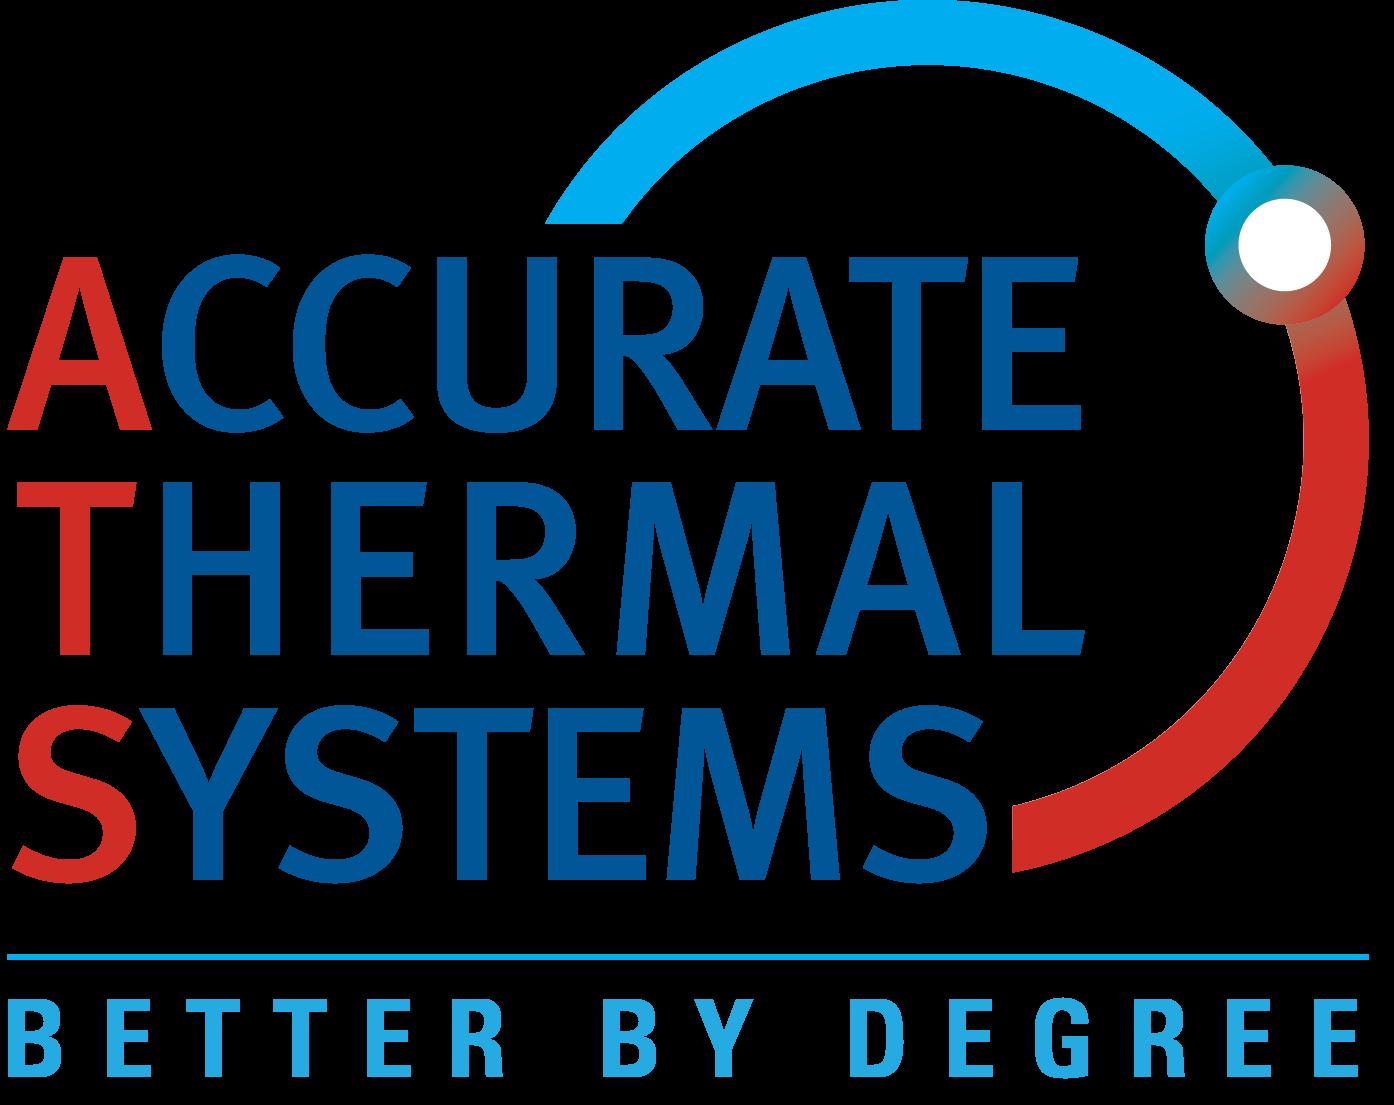 Fluidized baths, dry block temperature calibrators, heating circulating baths, refrigerated baths, Accuthermal.com